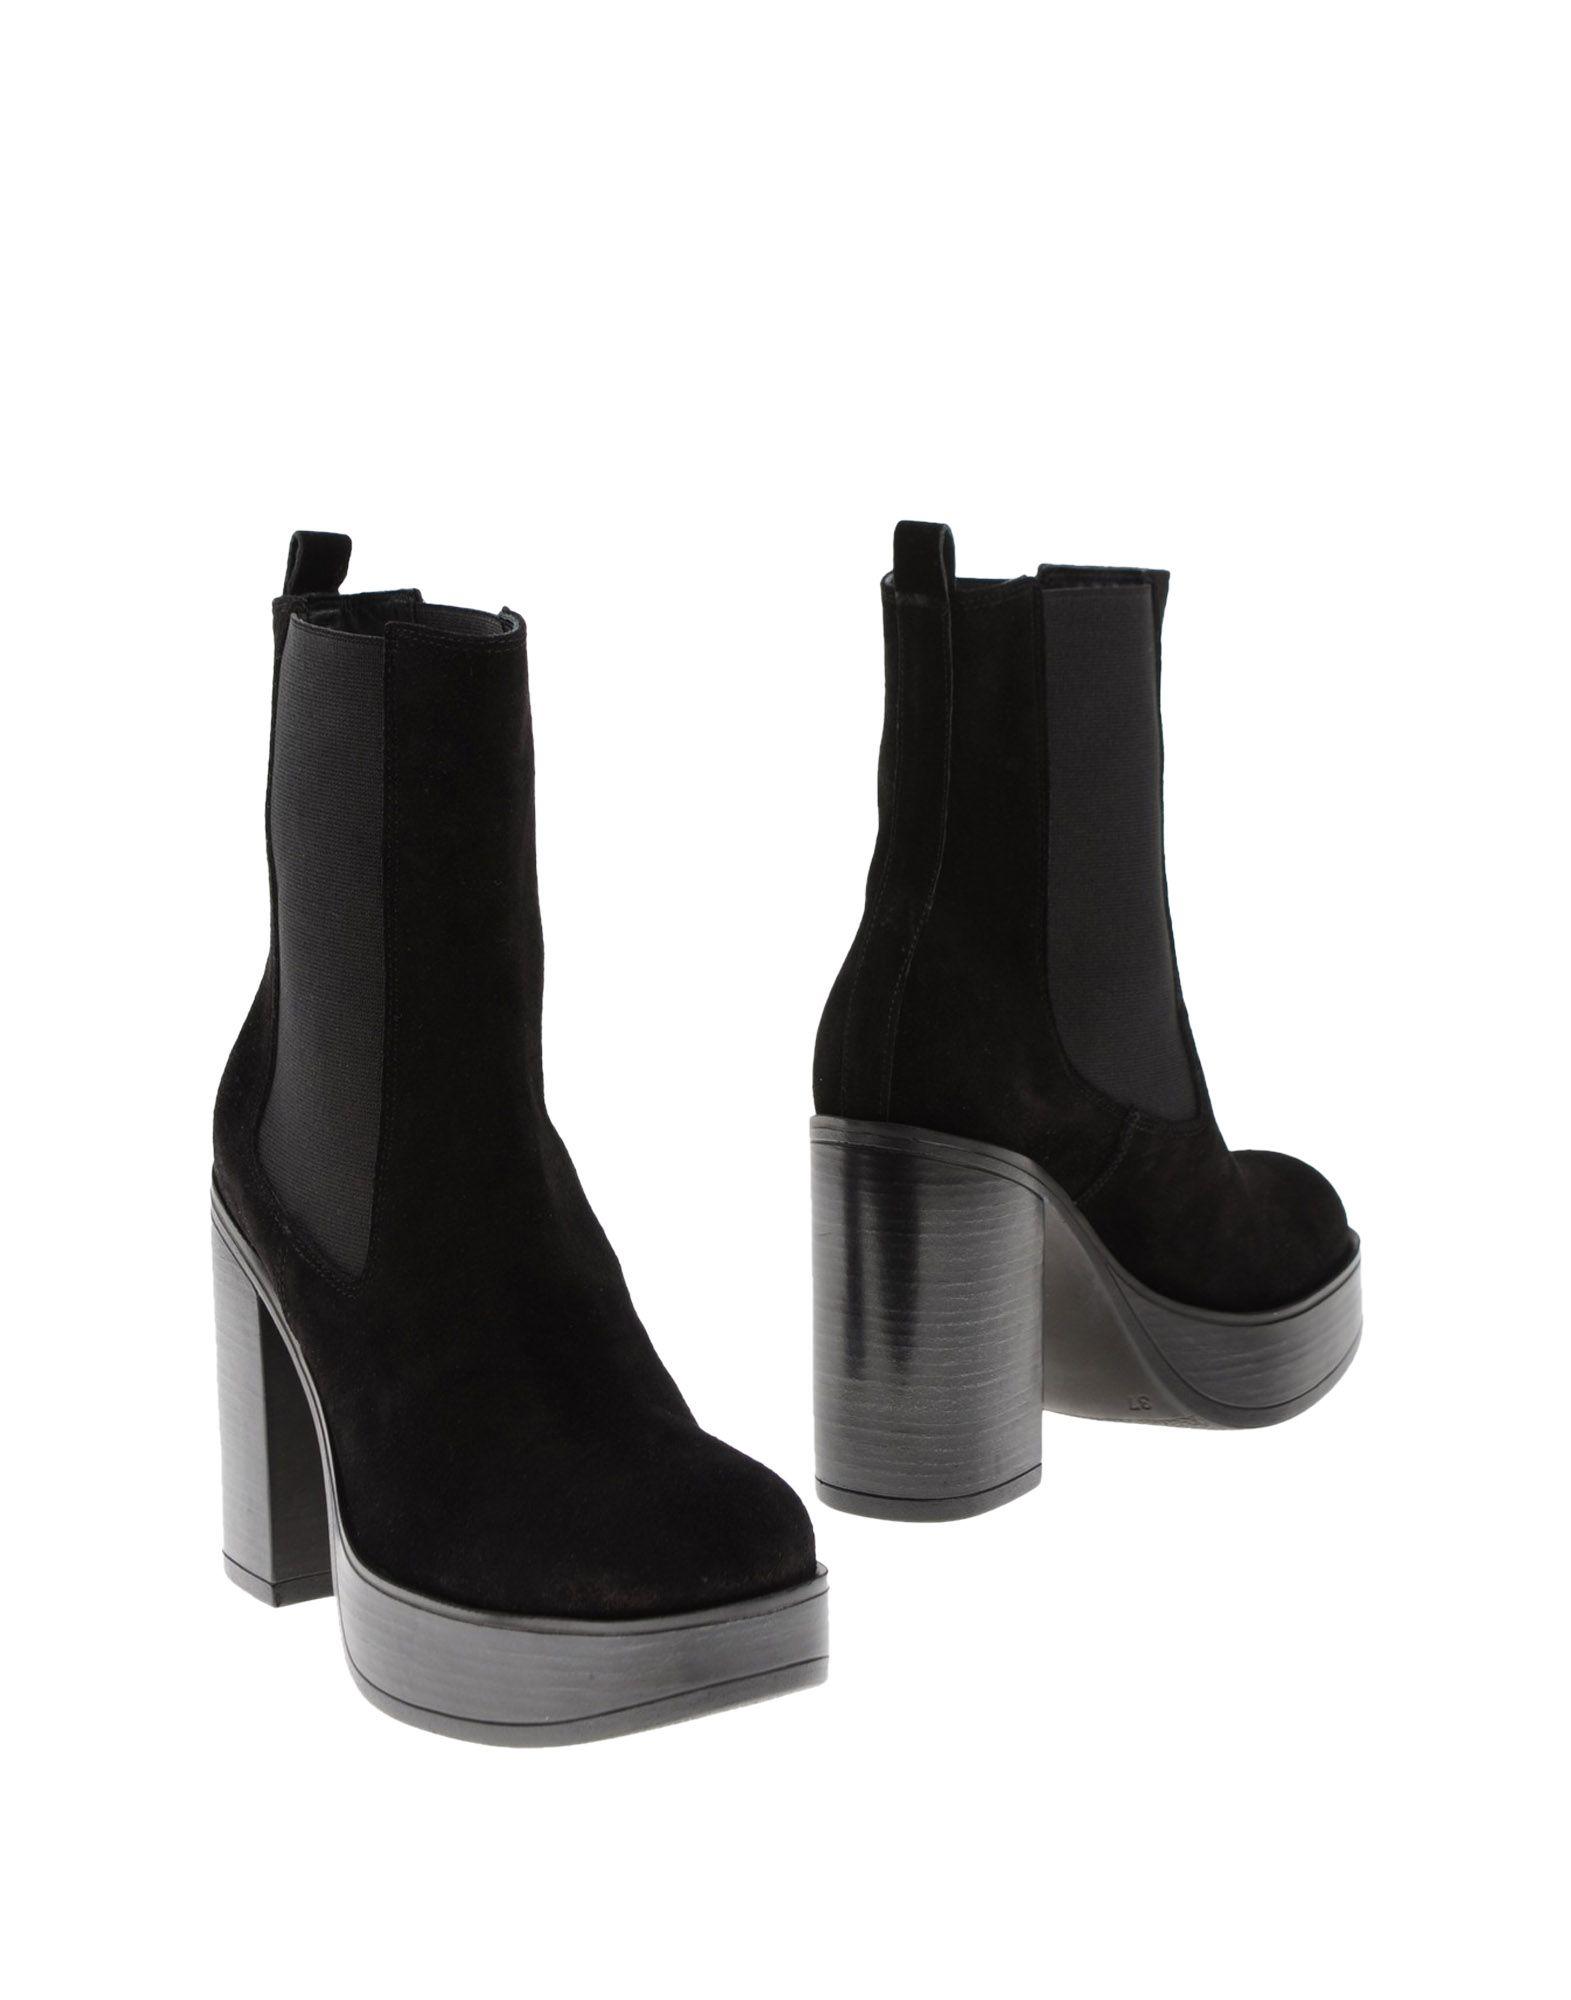 JEANNOT Полусапоги и высокие ботинки jeannot полусапоги и высокие ботинки